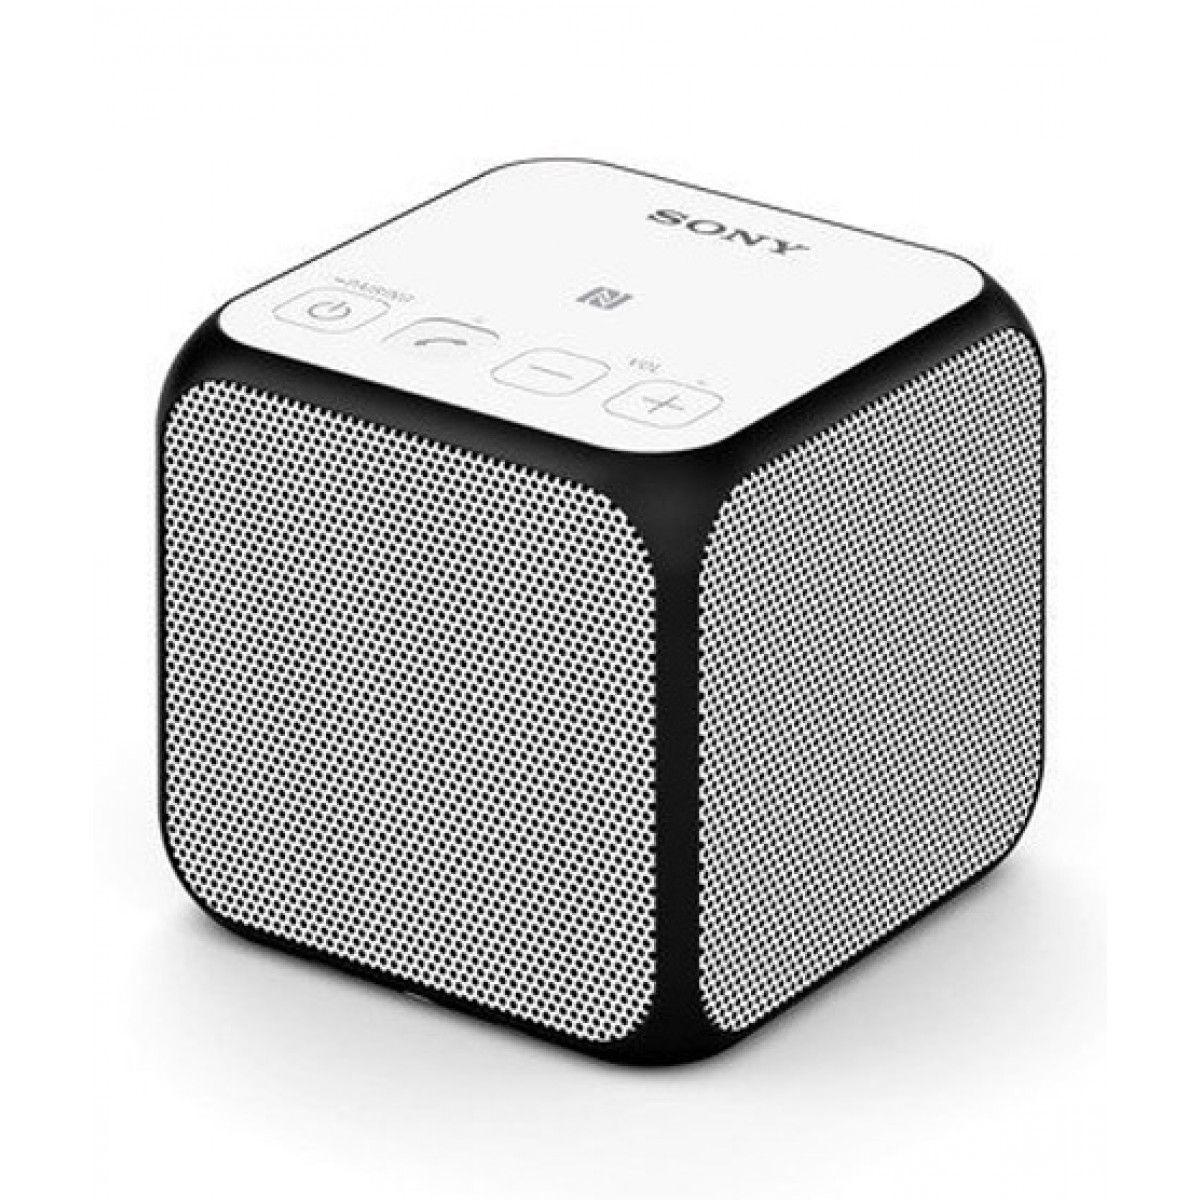 Sony (SRS-X11) Portable Bluetooth Speaker